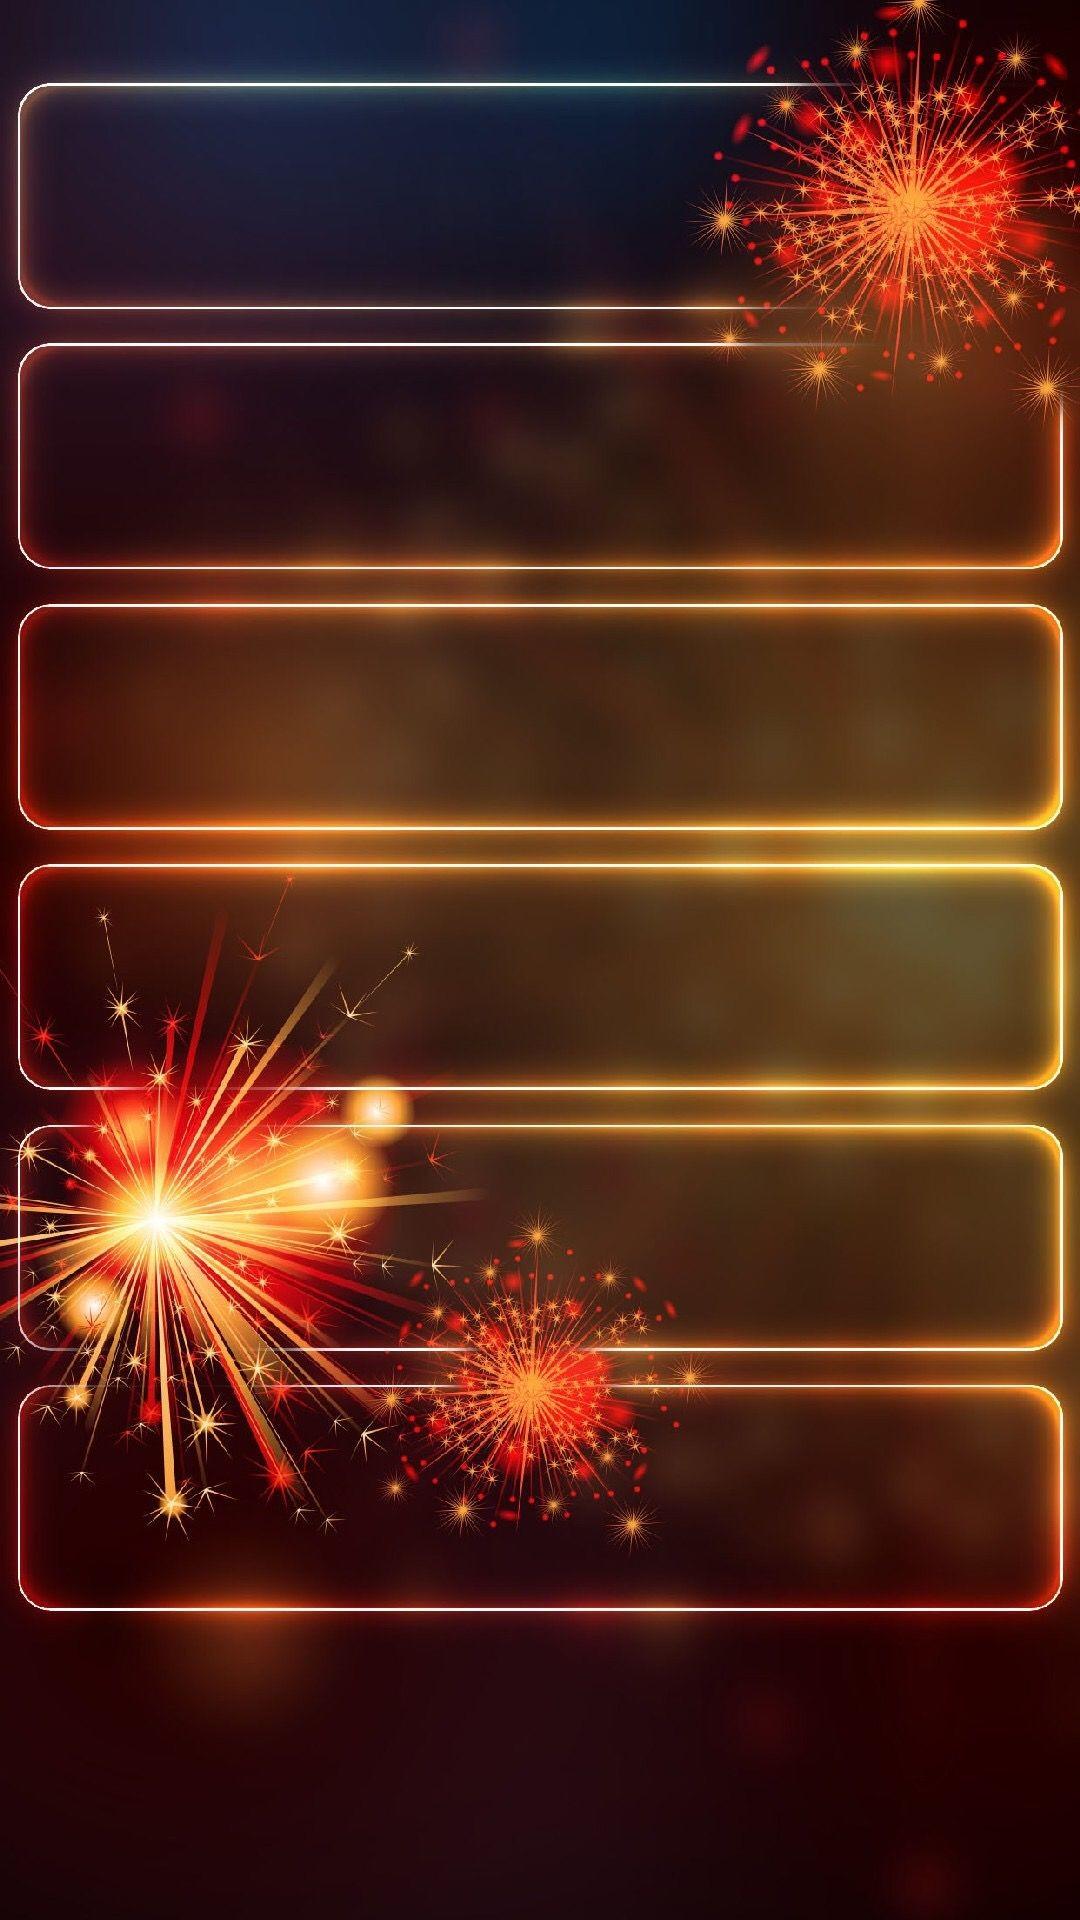 Res: 1080x1920, Shelves Fireworks Colorful Bright Lights Flash Sparkle